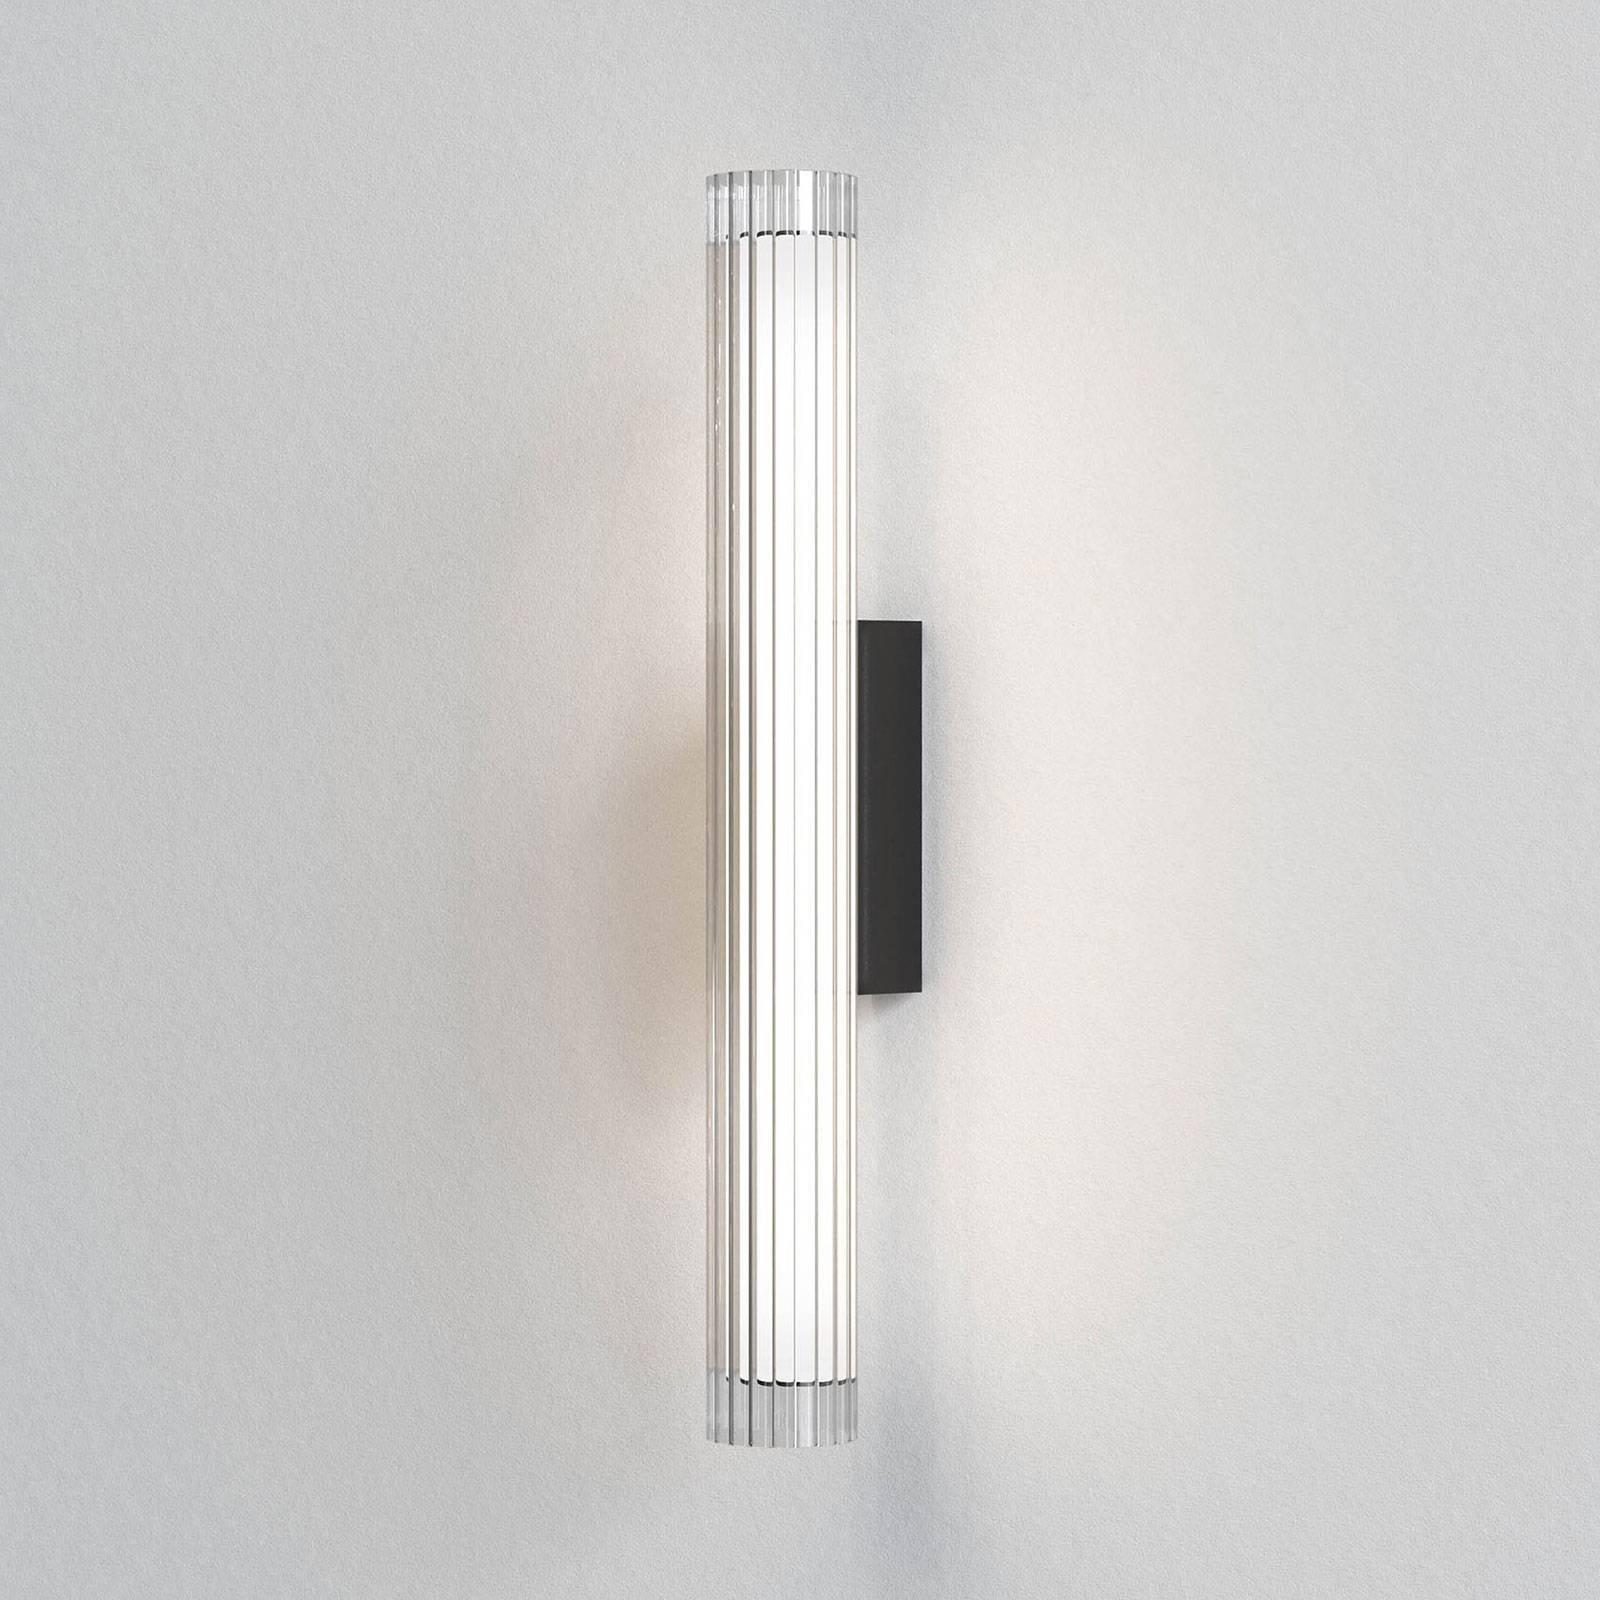 Astro io Wall LED-vegglampe IP44, svart, 66,5 cm